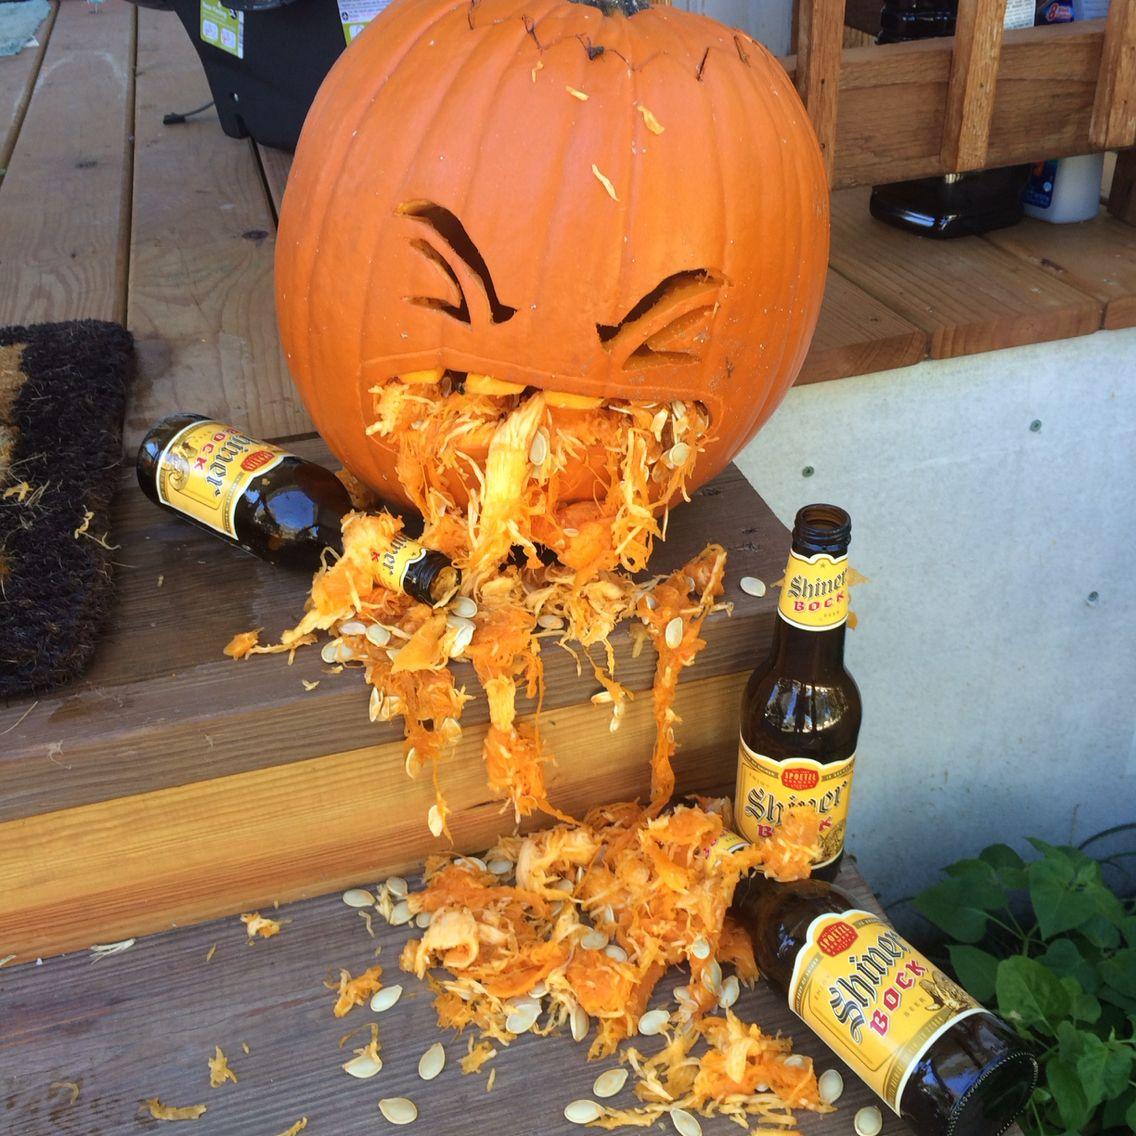 Puking Drunk Pumpkin Halloween Pumpkin Drunk On Shiner Bock Halloween Decor  Pumpkin Throwing Up Funny Pumpkin